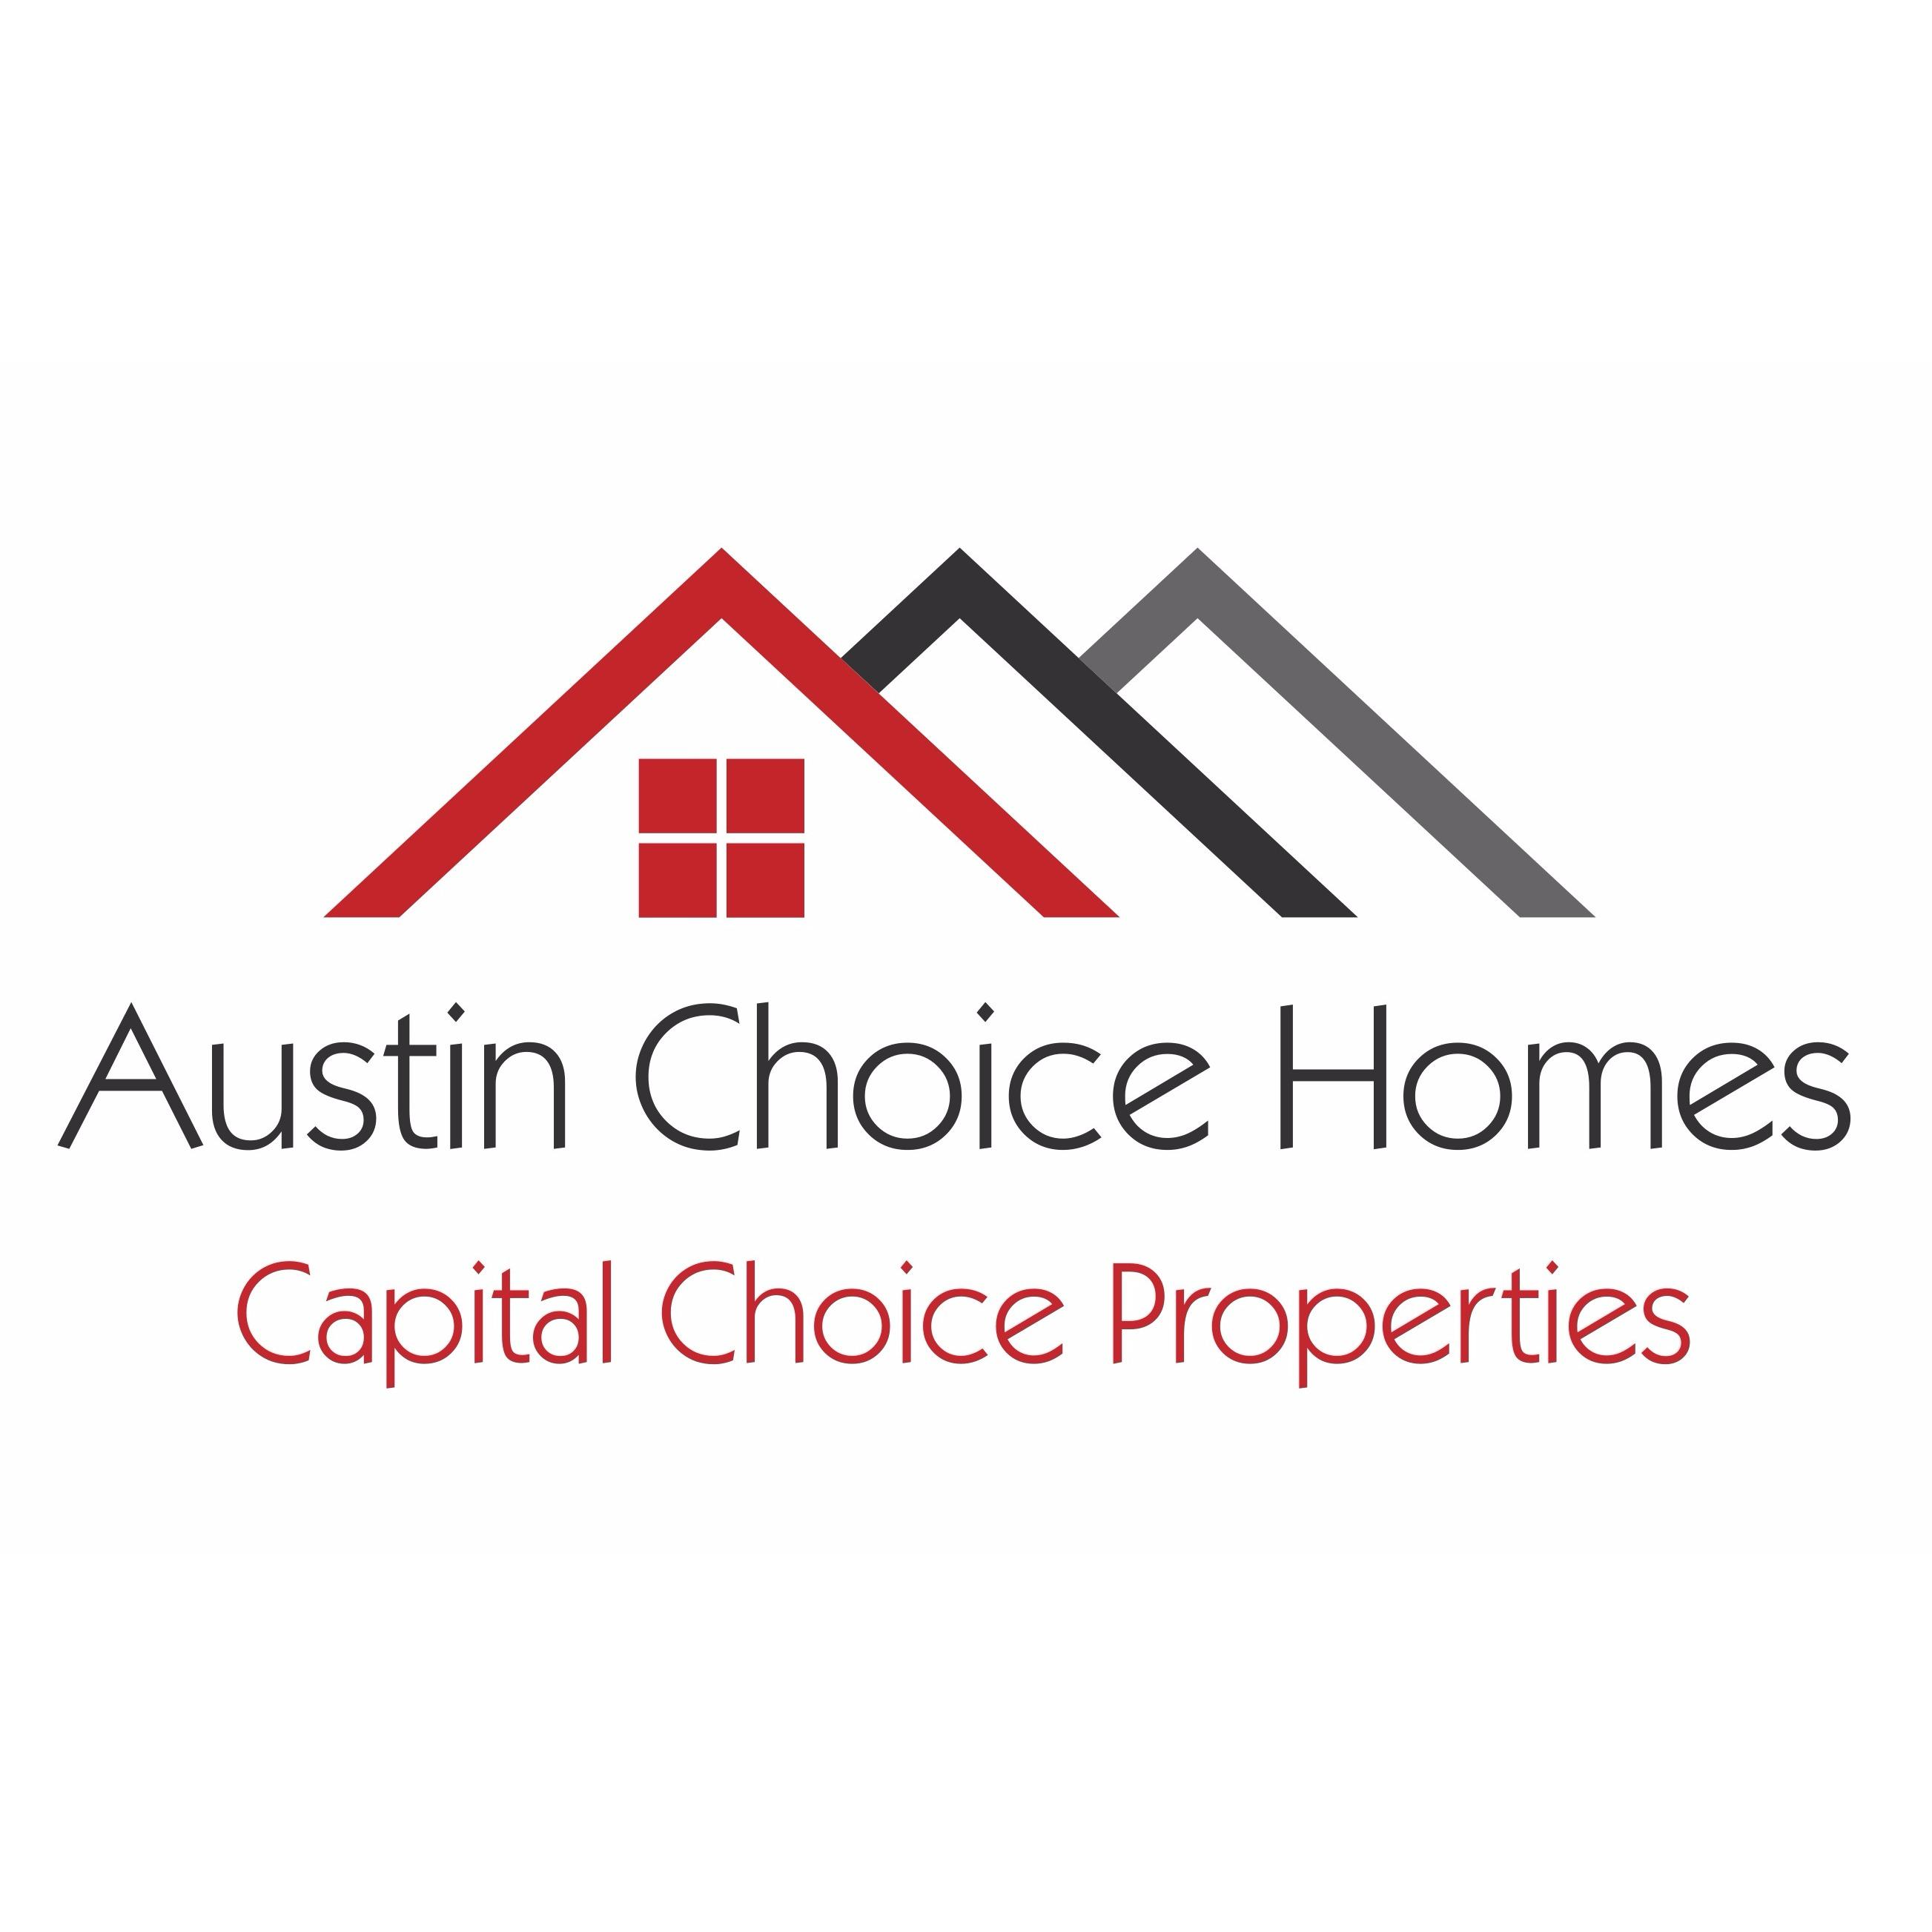 Capital Choice Properties